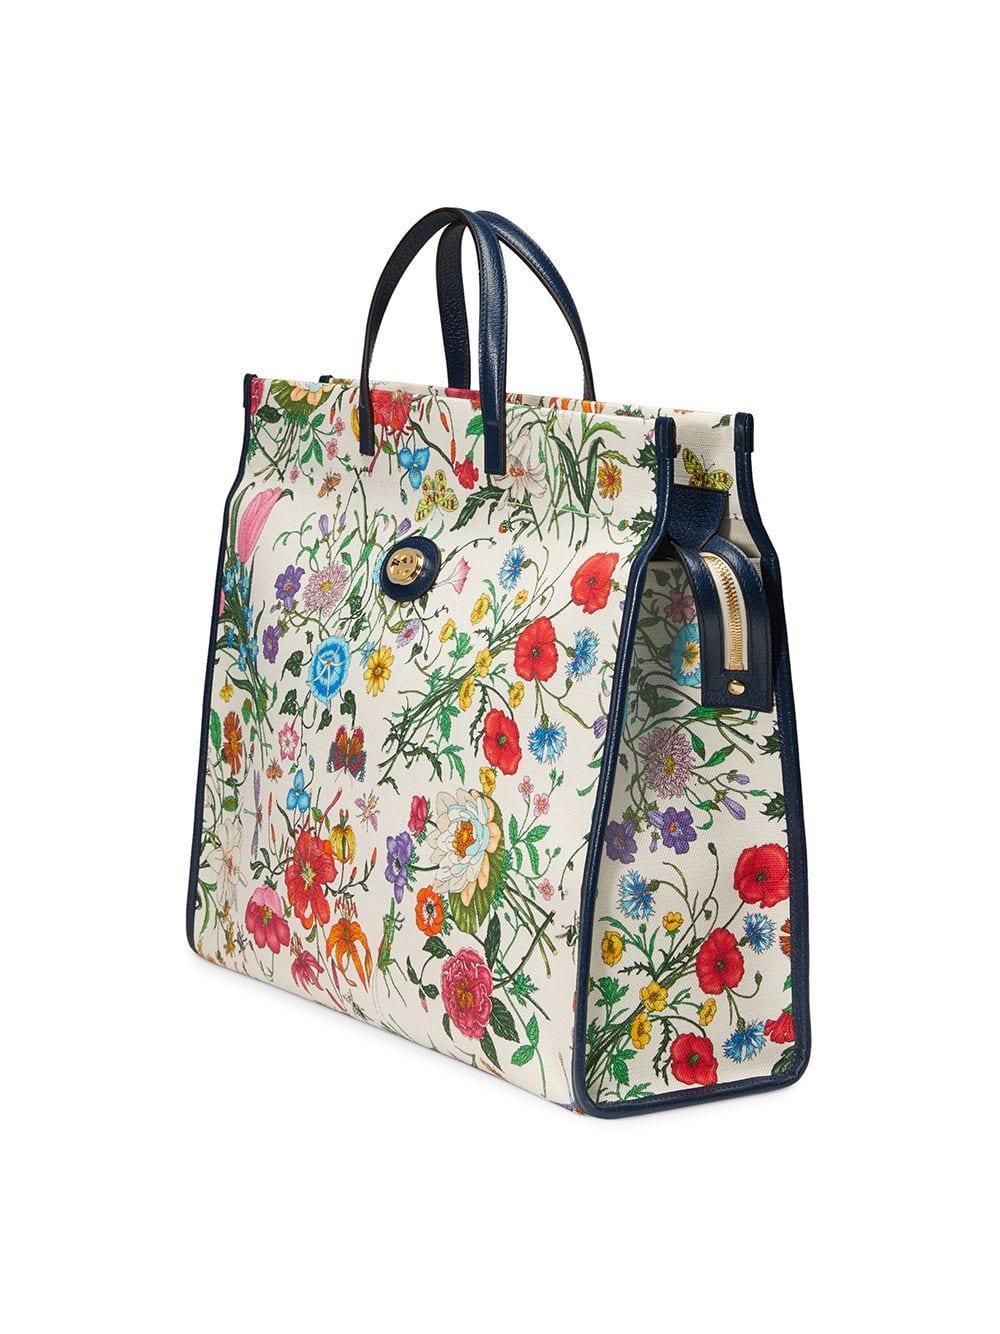 8a42e74d6242 Gucci - White Floral Print Tote - Lyst. View fullscreen